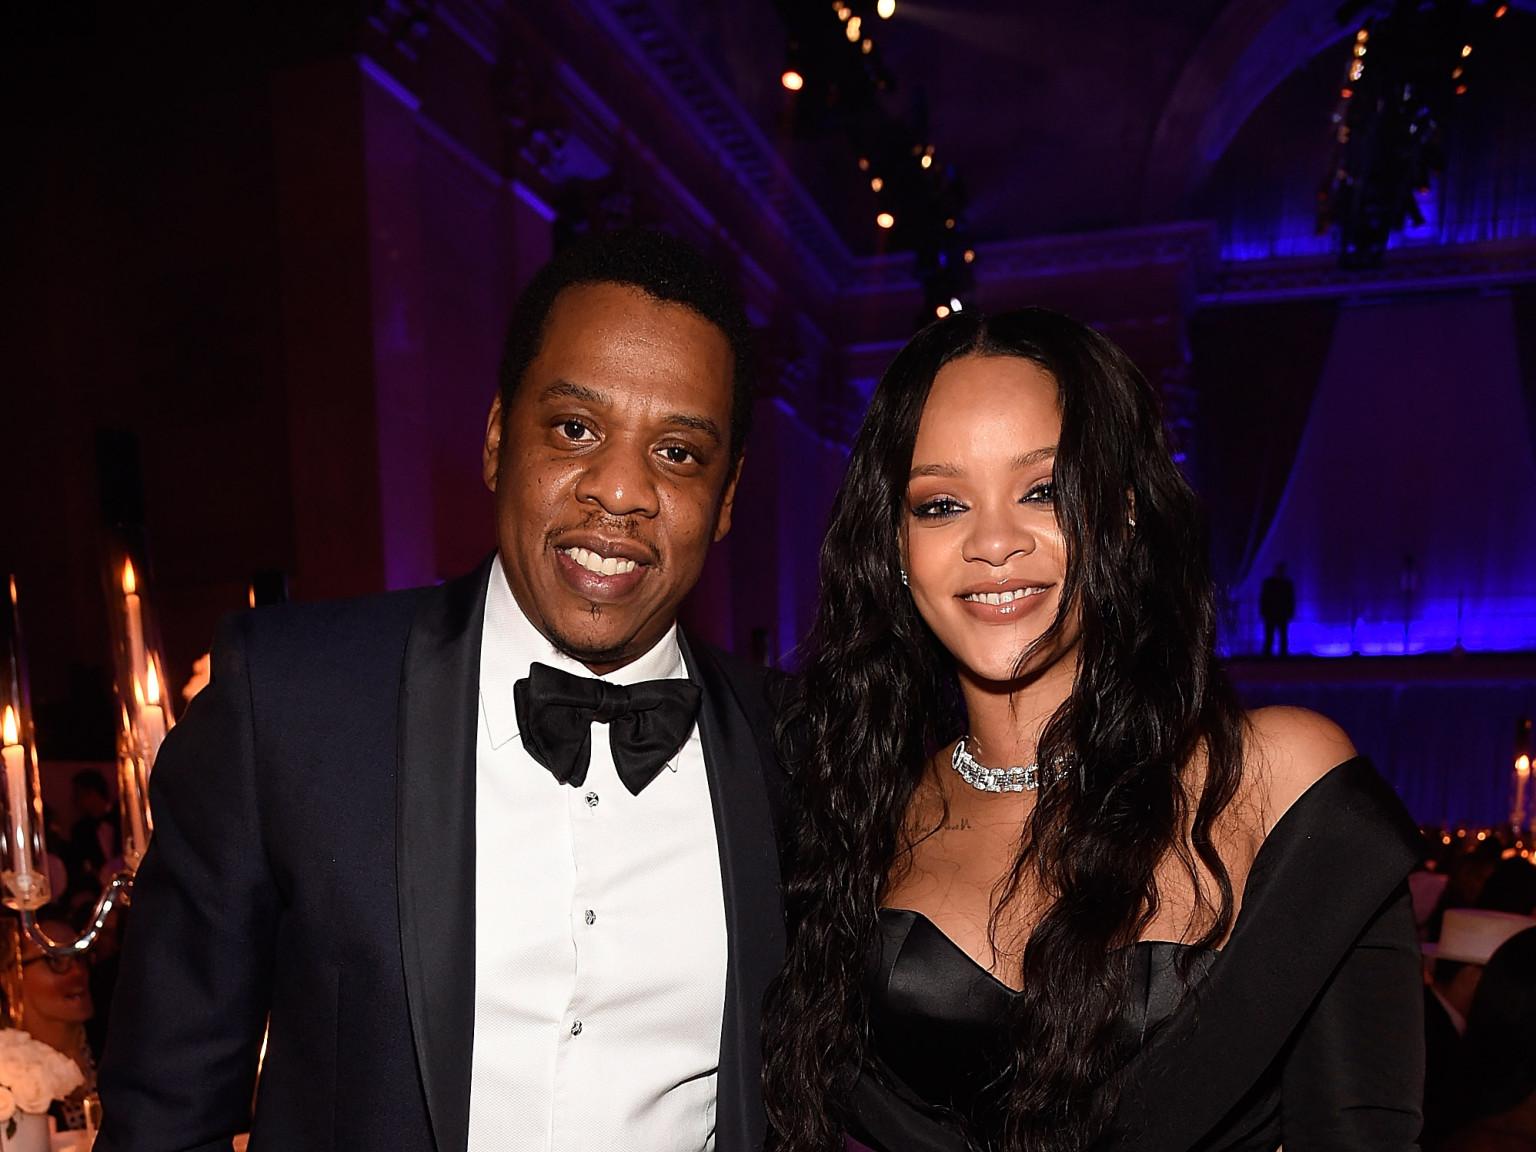 Jay-Z & Rihanna Donate $1 Million Each for Coronavirus Relief Efforts